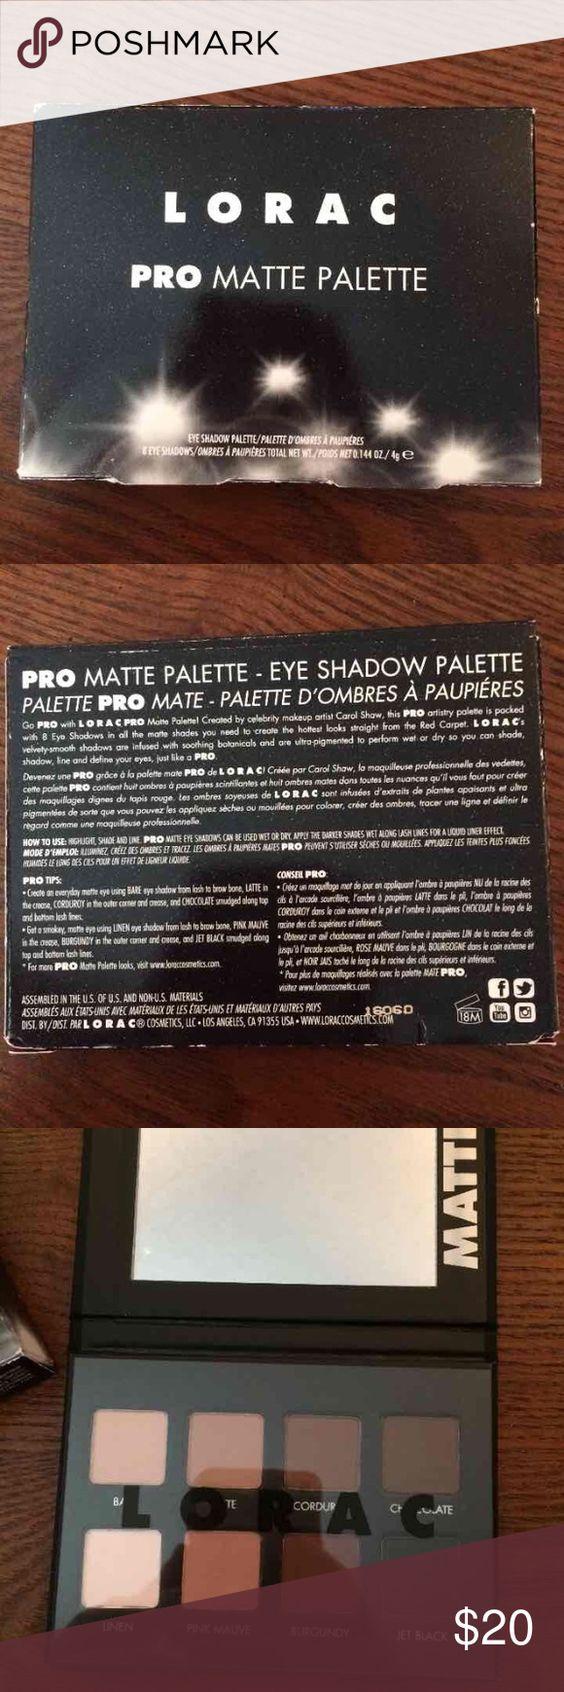 Lorac Pro Matte Palatte Brand new, never used lorac Makeup Eyeshadow